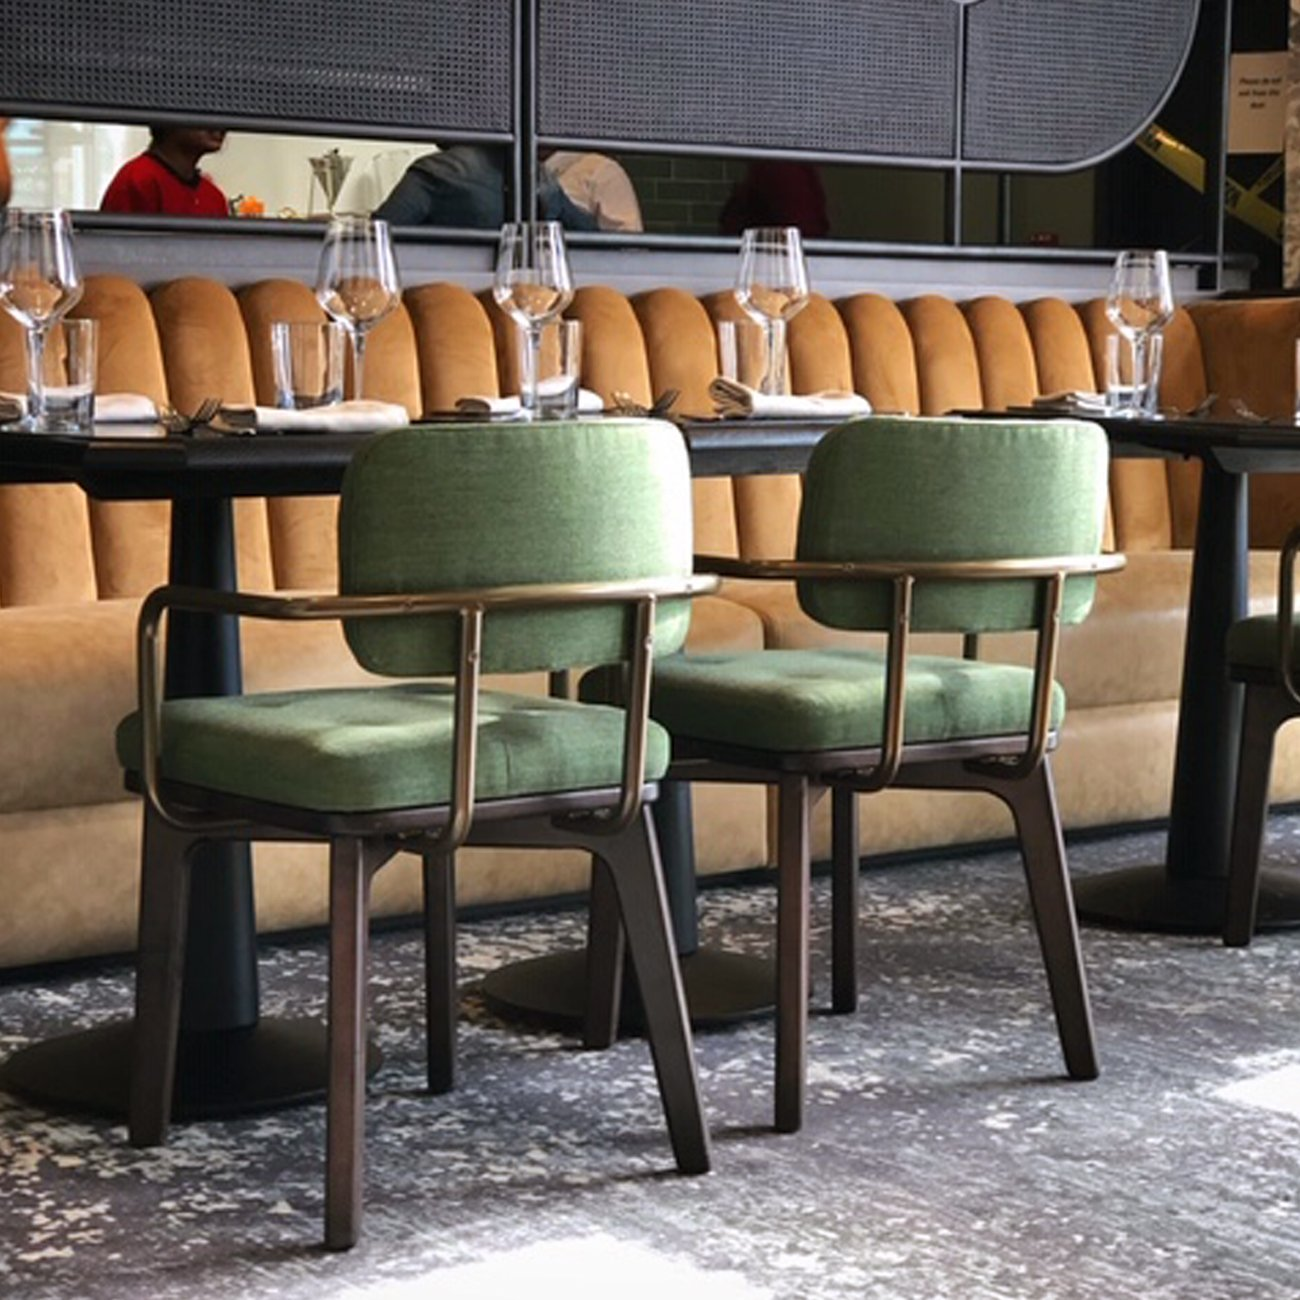 The Cyrus Hotel - CIX Direct Furnishings